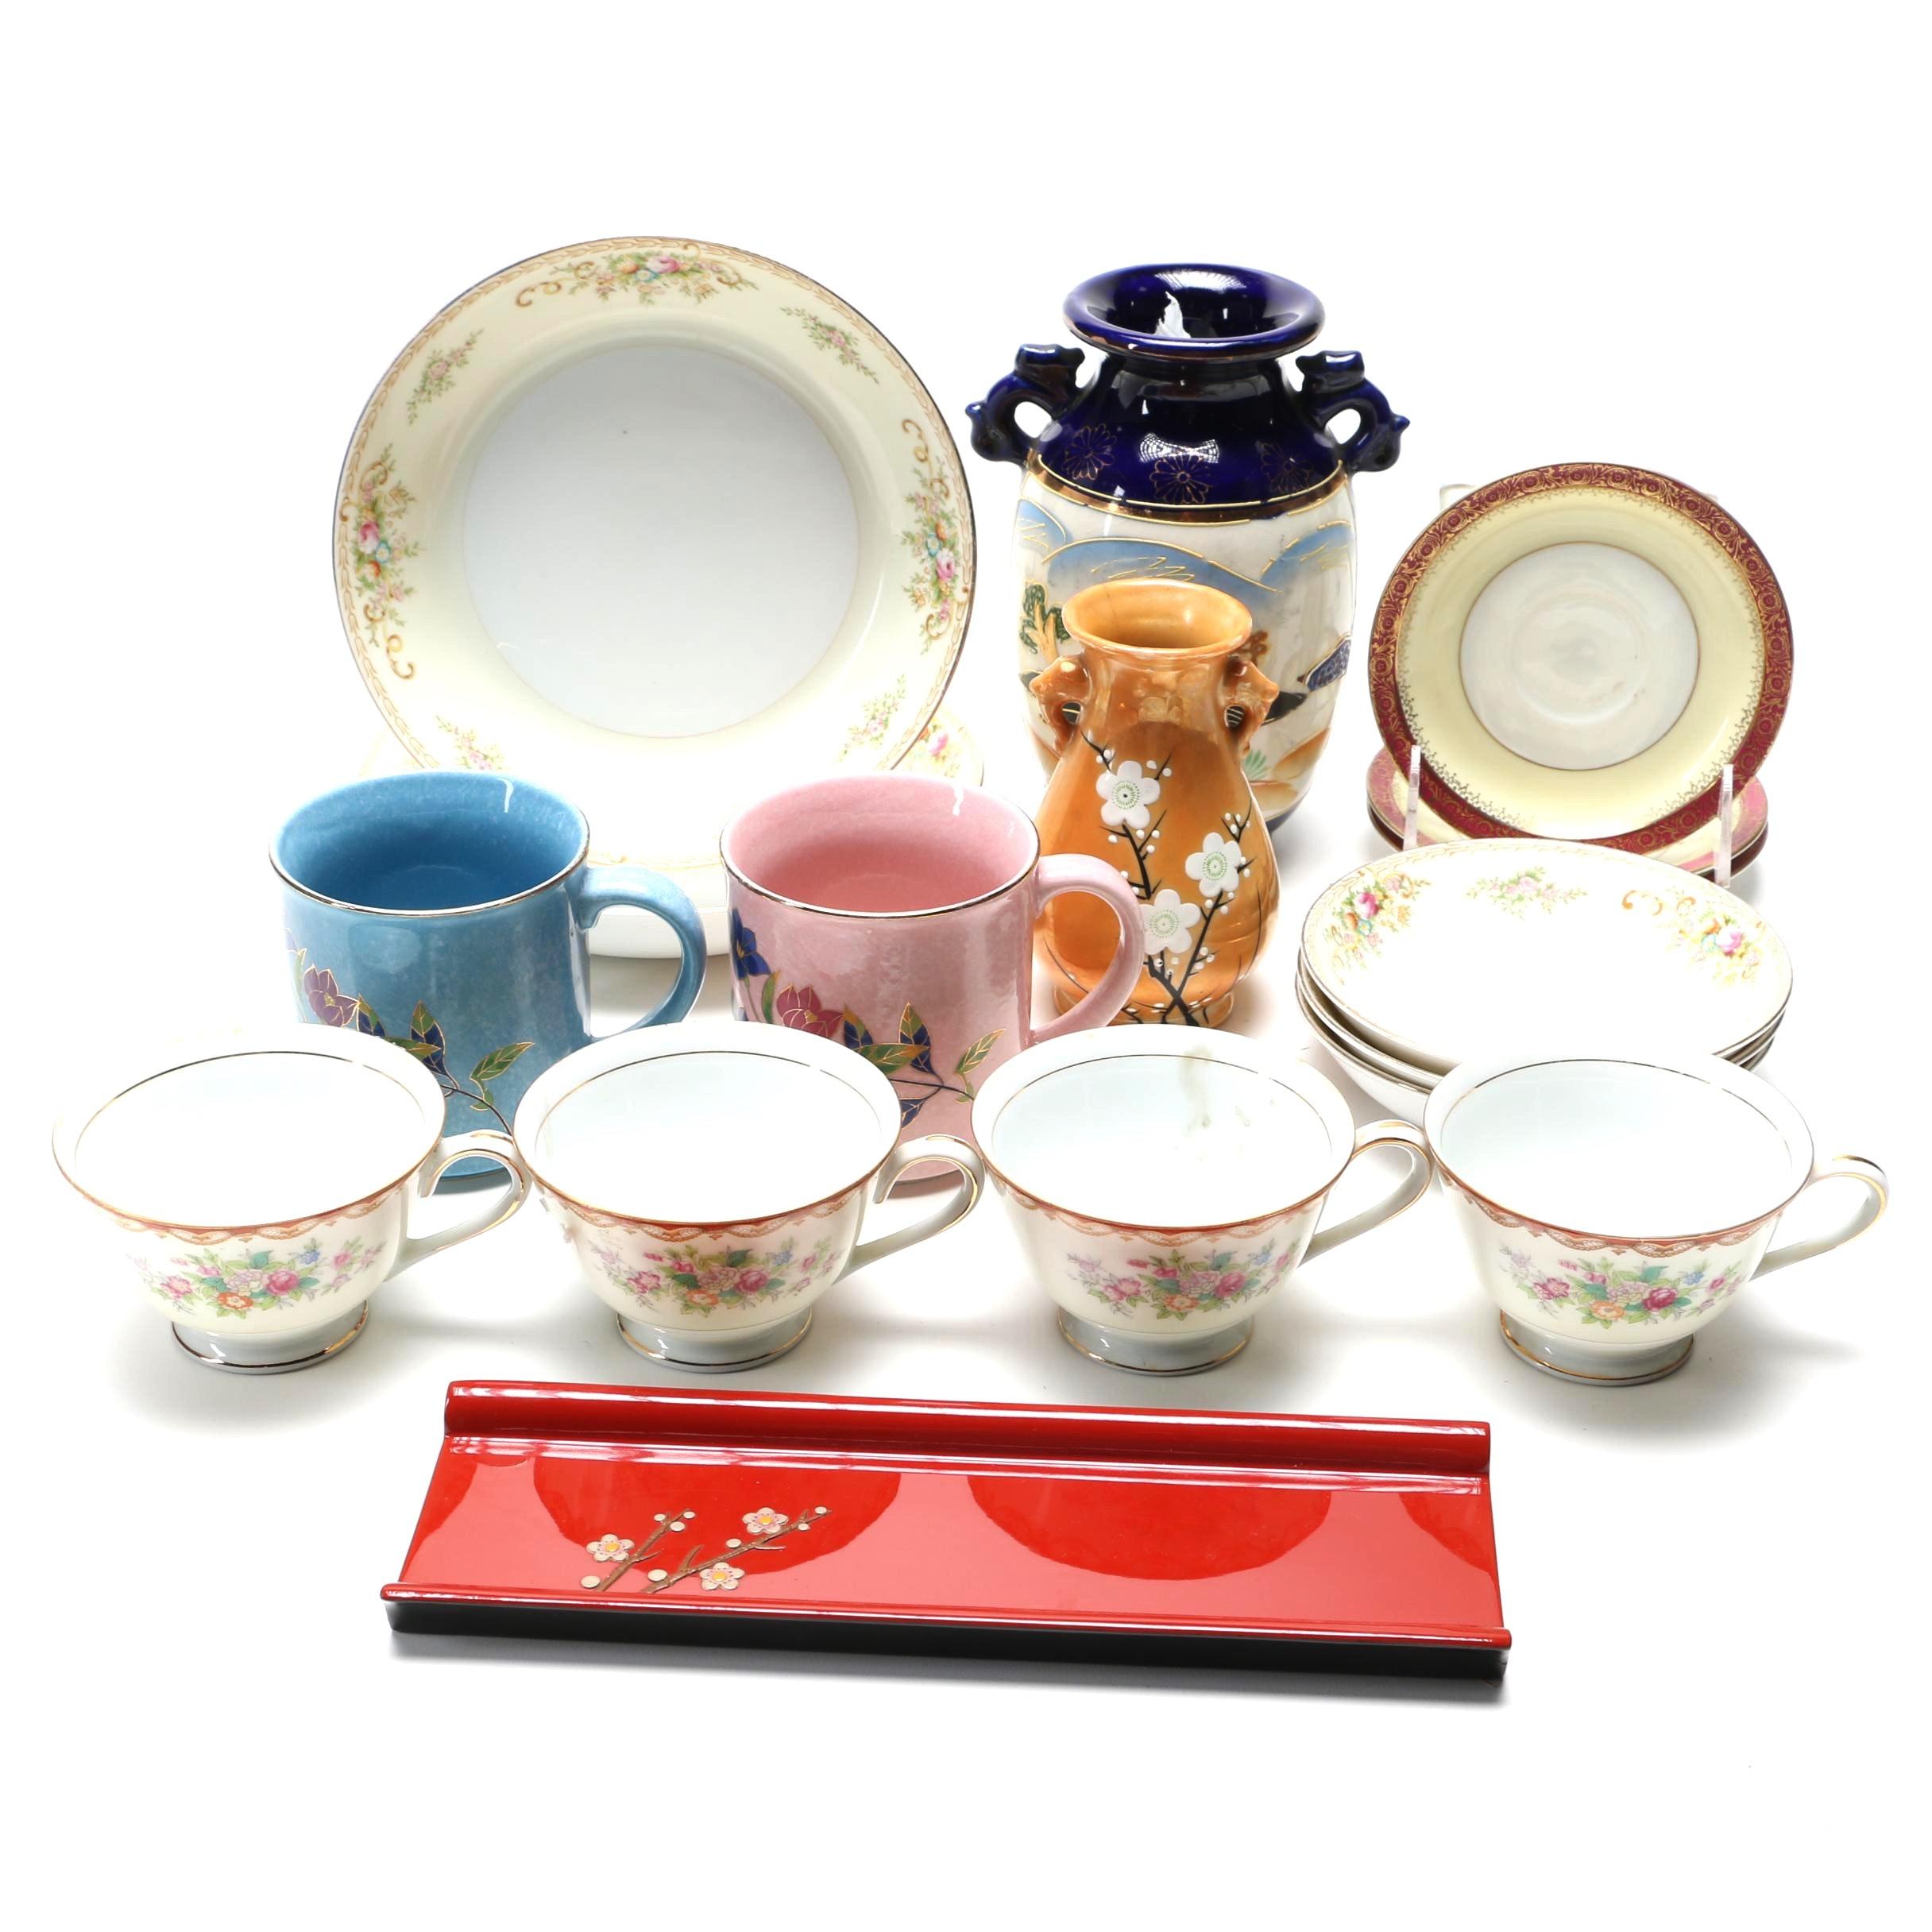 Japanese Ceramic Tableware Including Meito and Diamond China